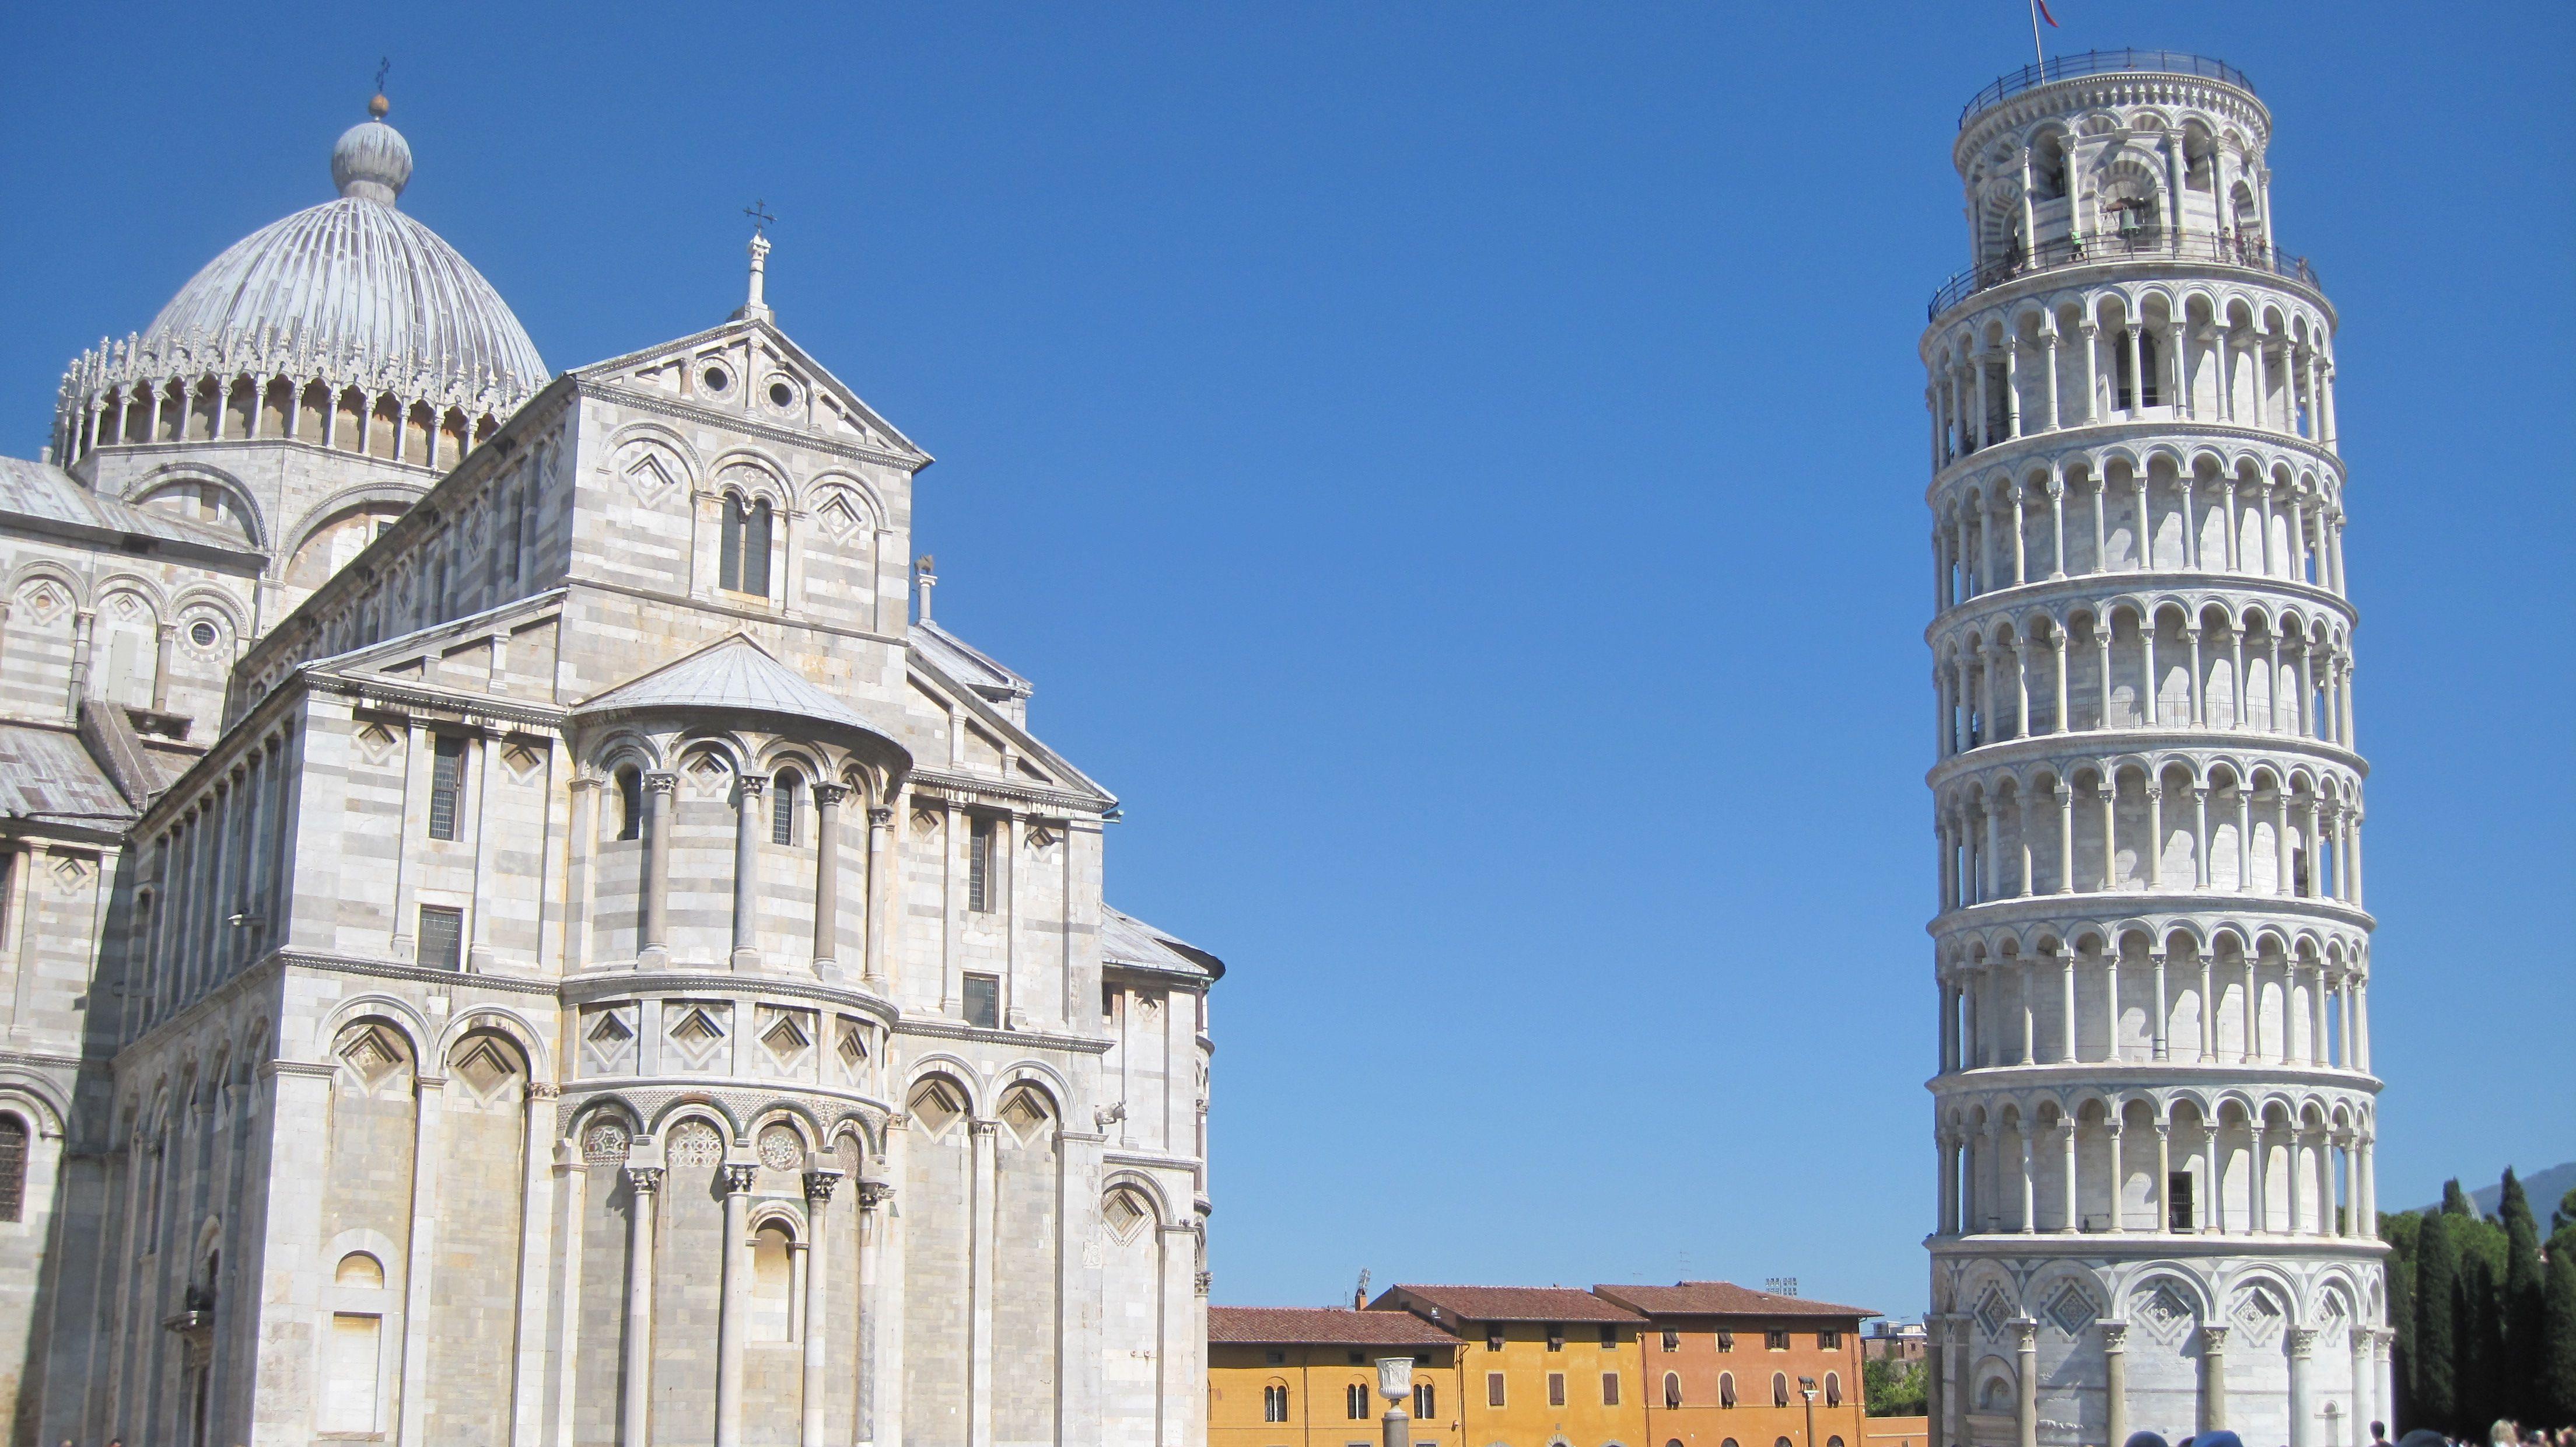 Urlaub in #Pisa - #Toskana